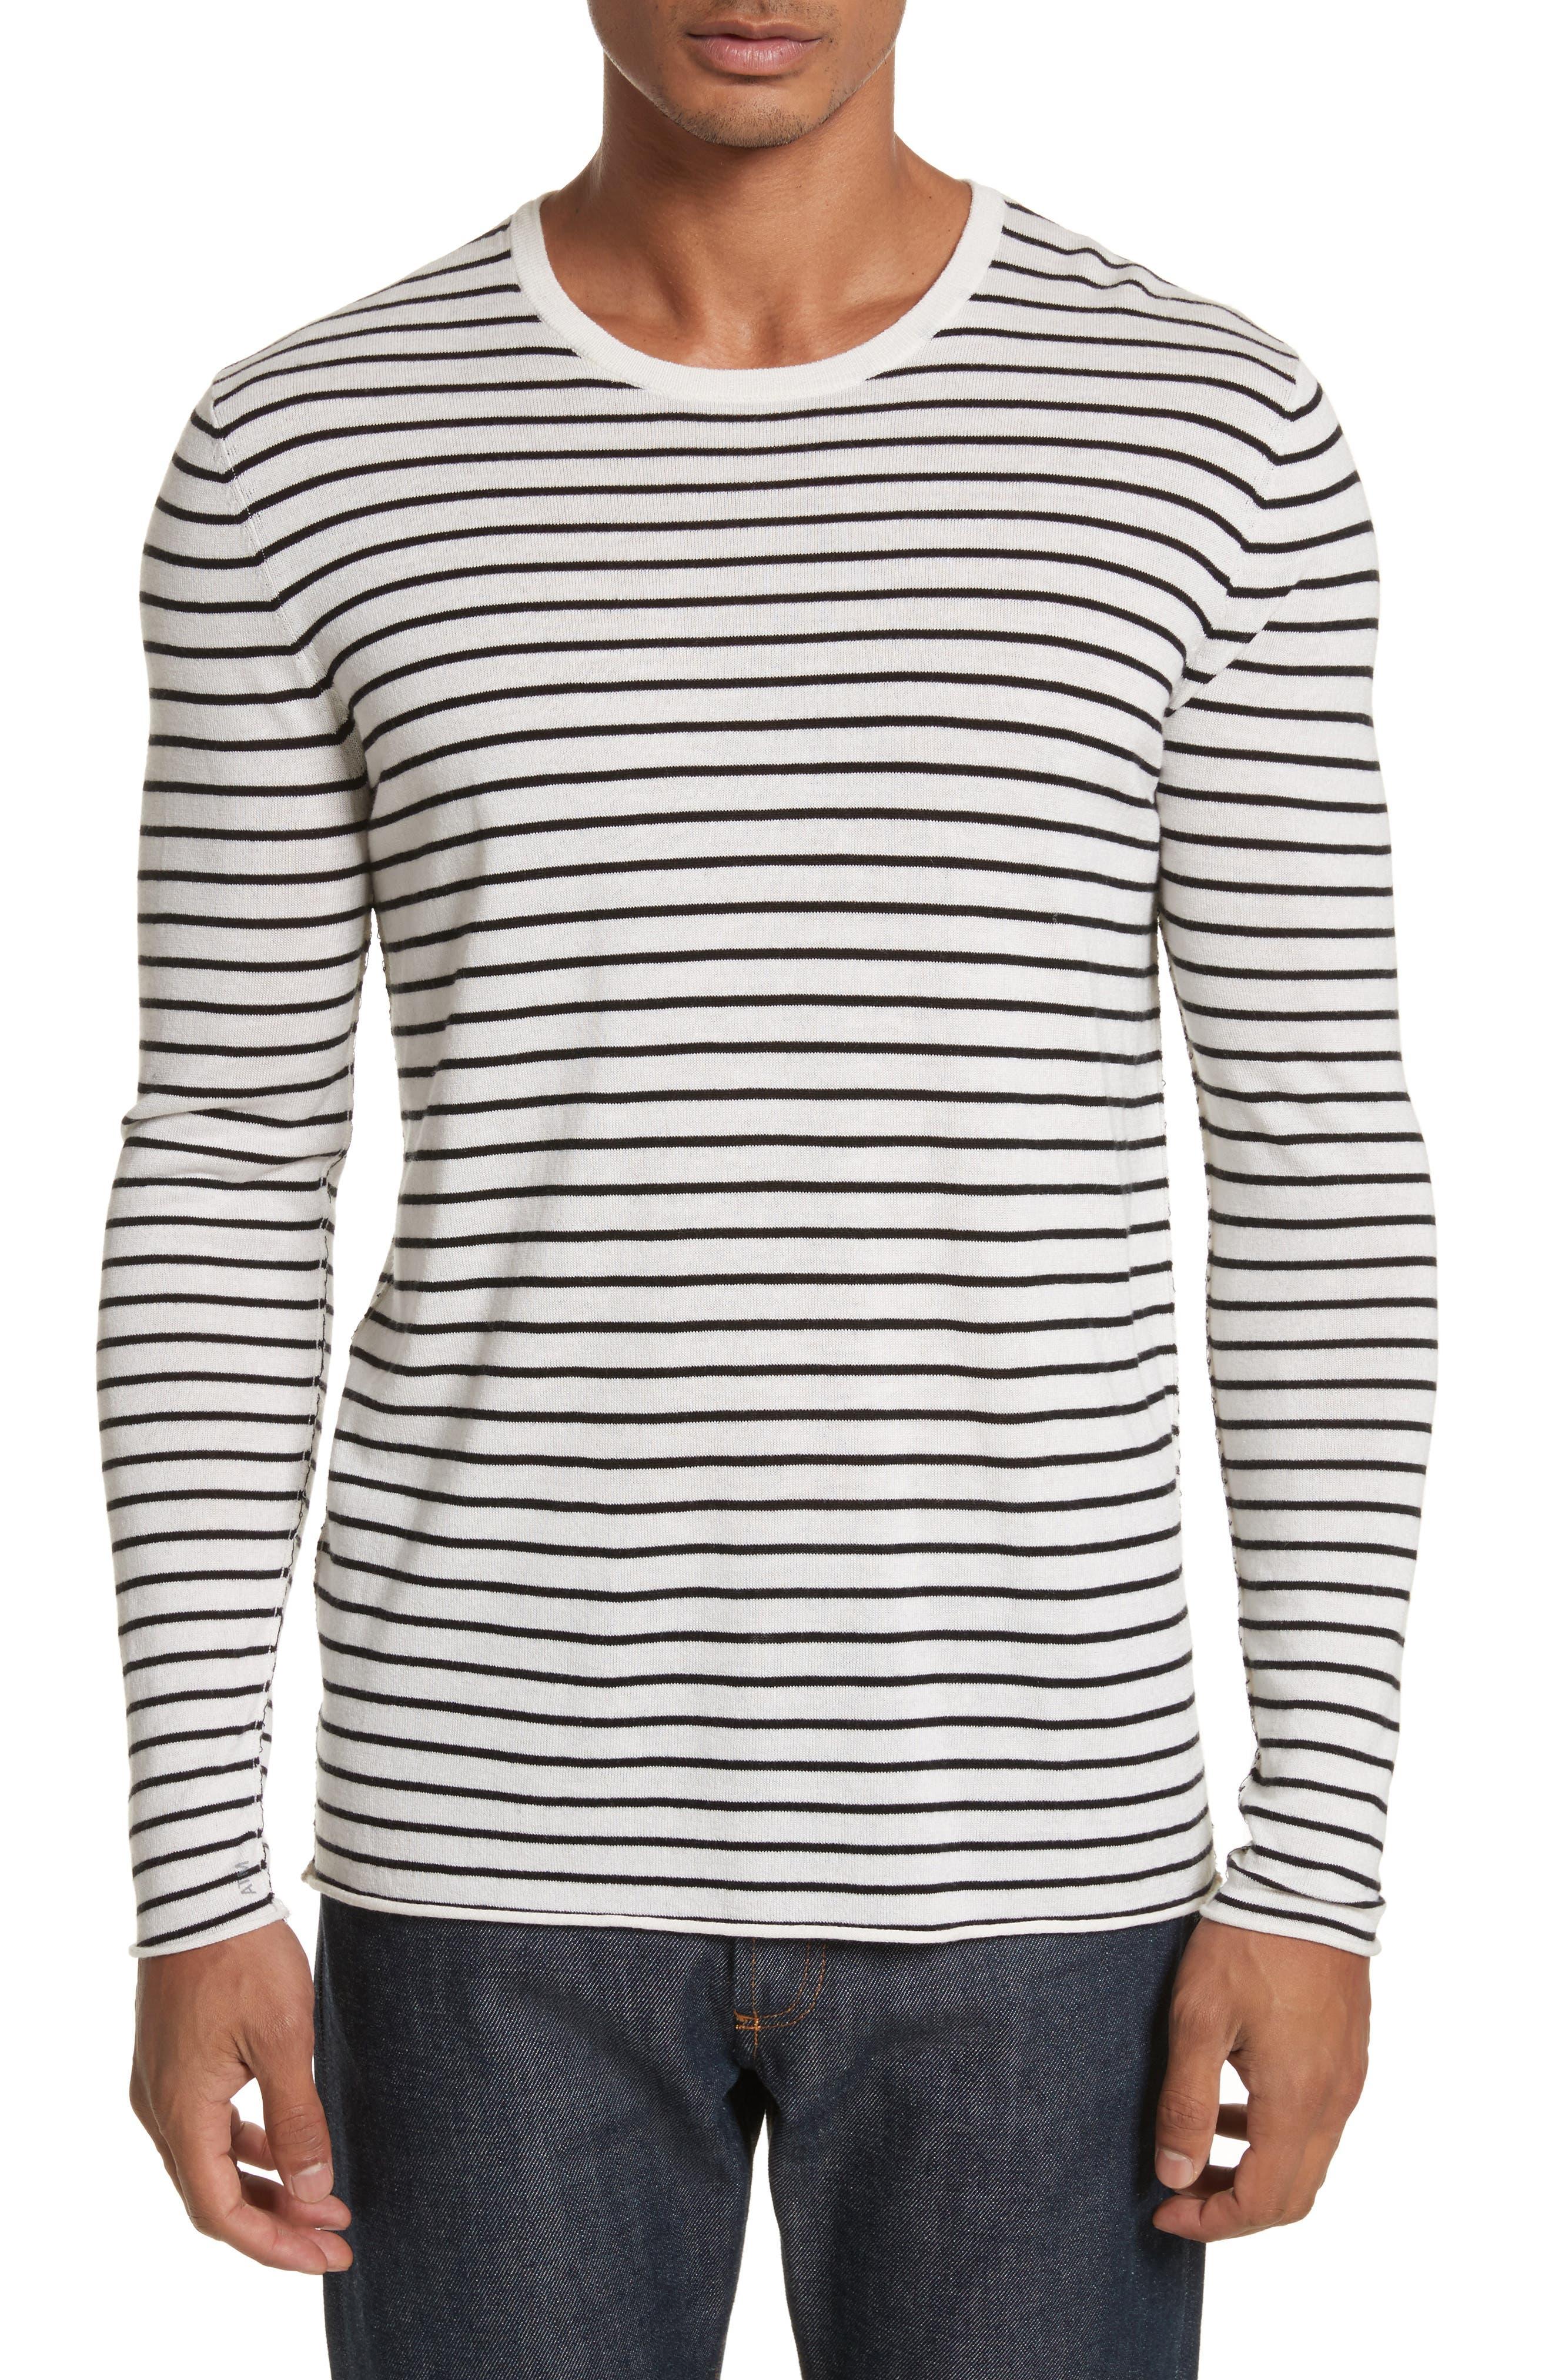 Alternate Image 1 Selected - ATM Anthony Thomas Melillo Stripe Silk Blend Sweater